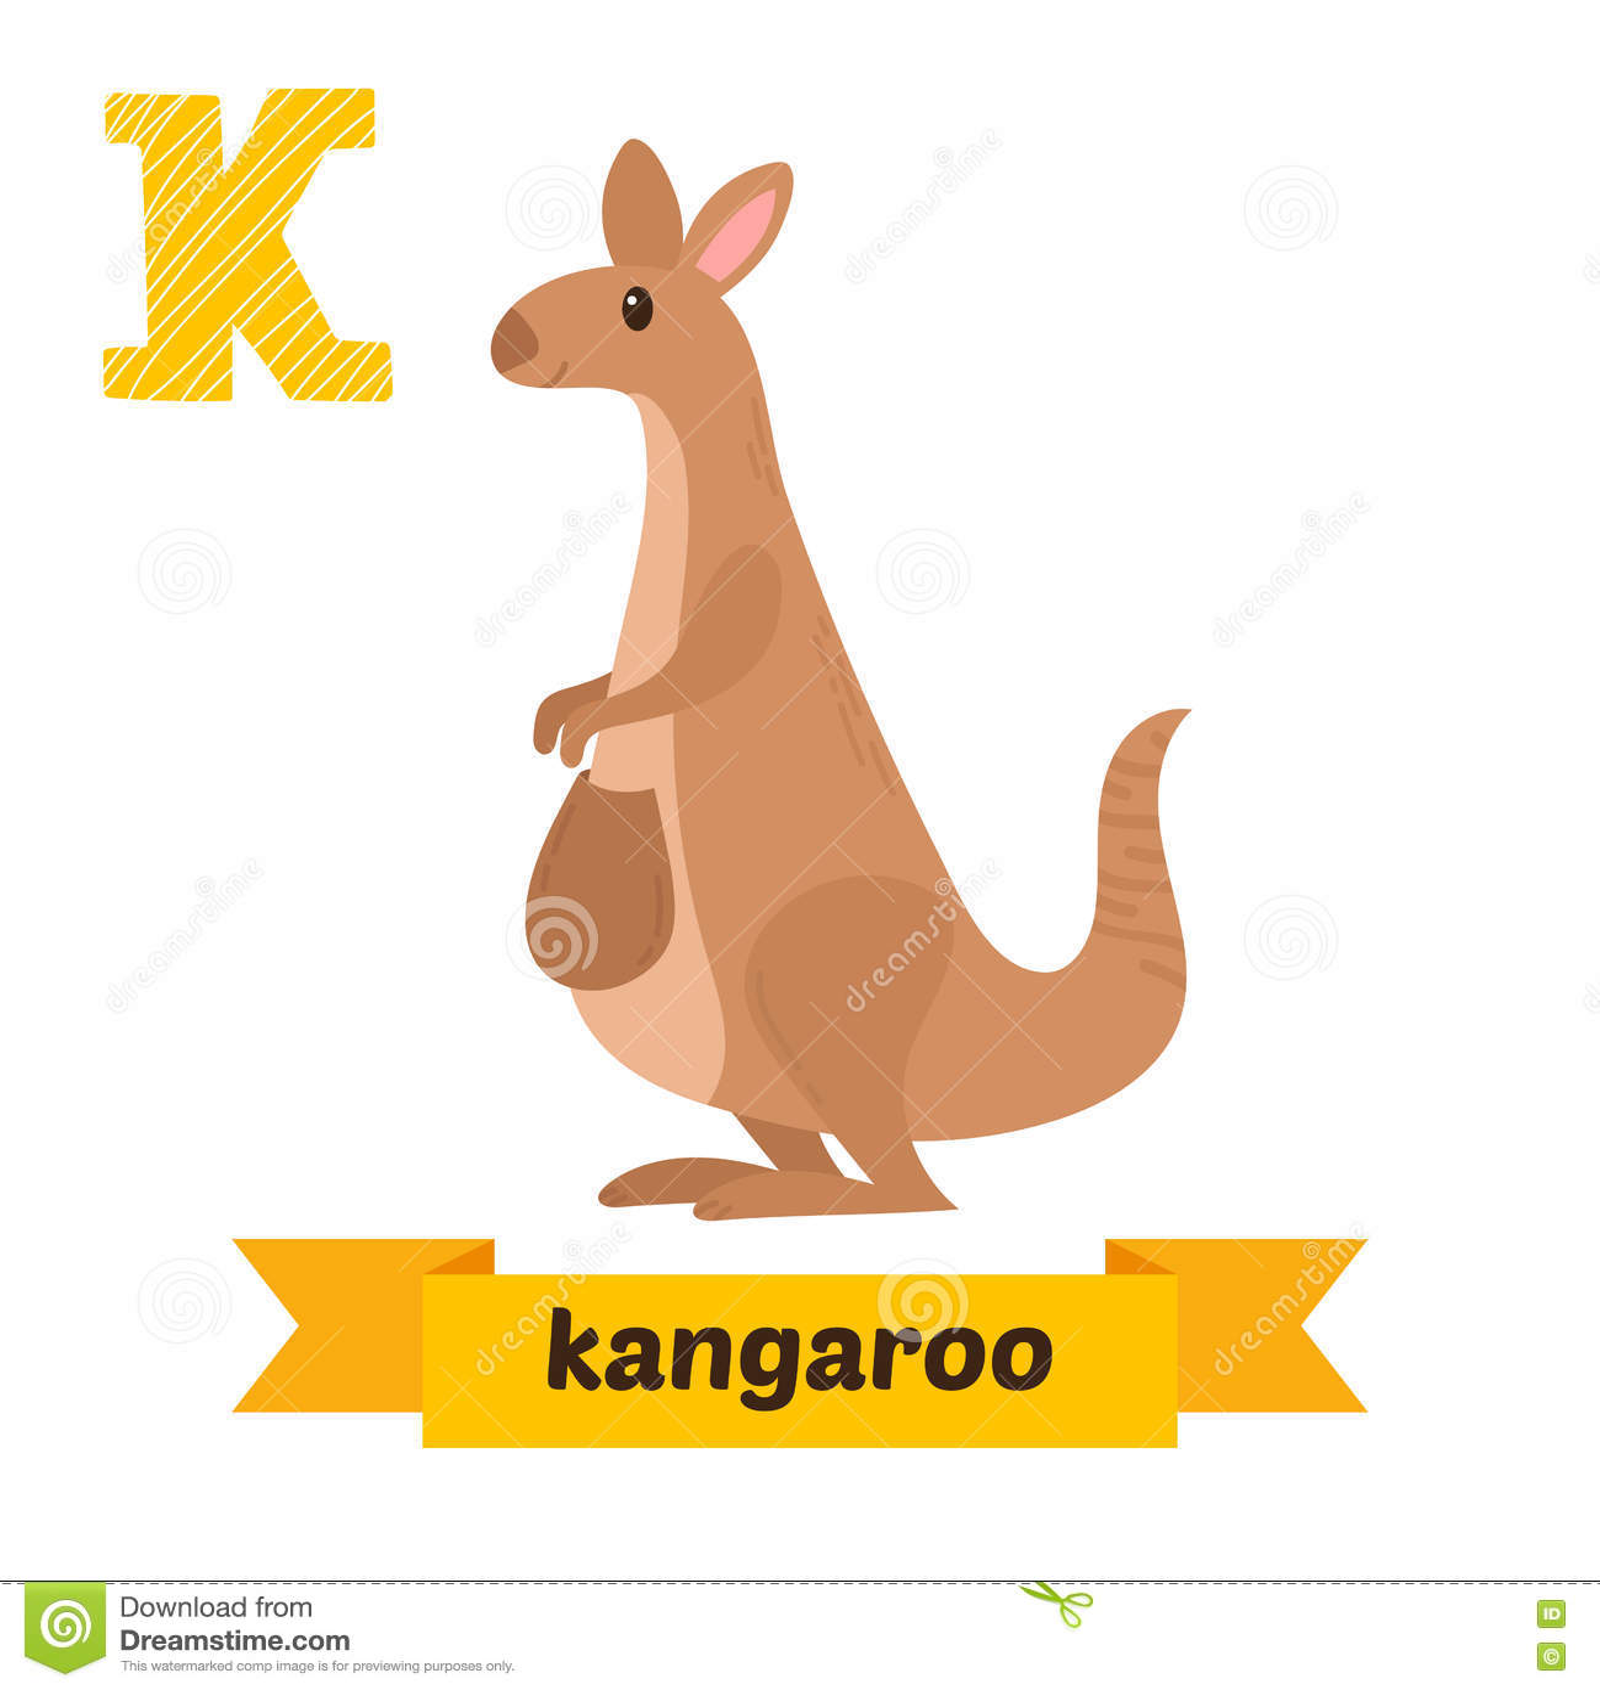 Kangaroo Vector Logo Lettering Vector Illustration